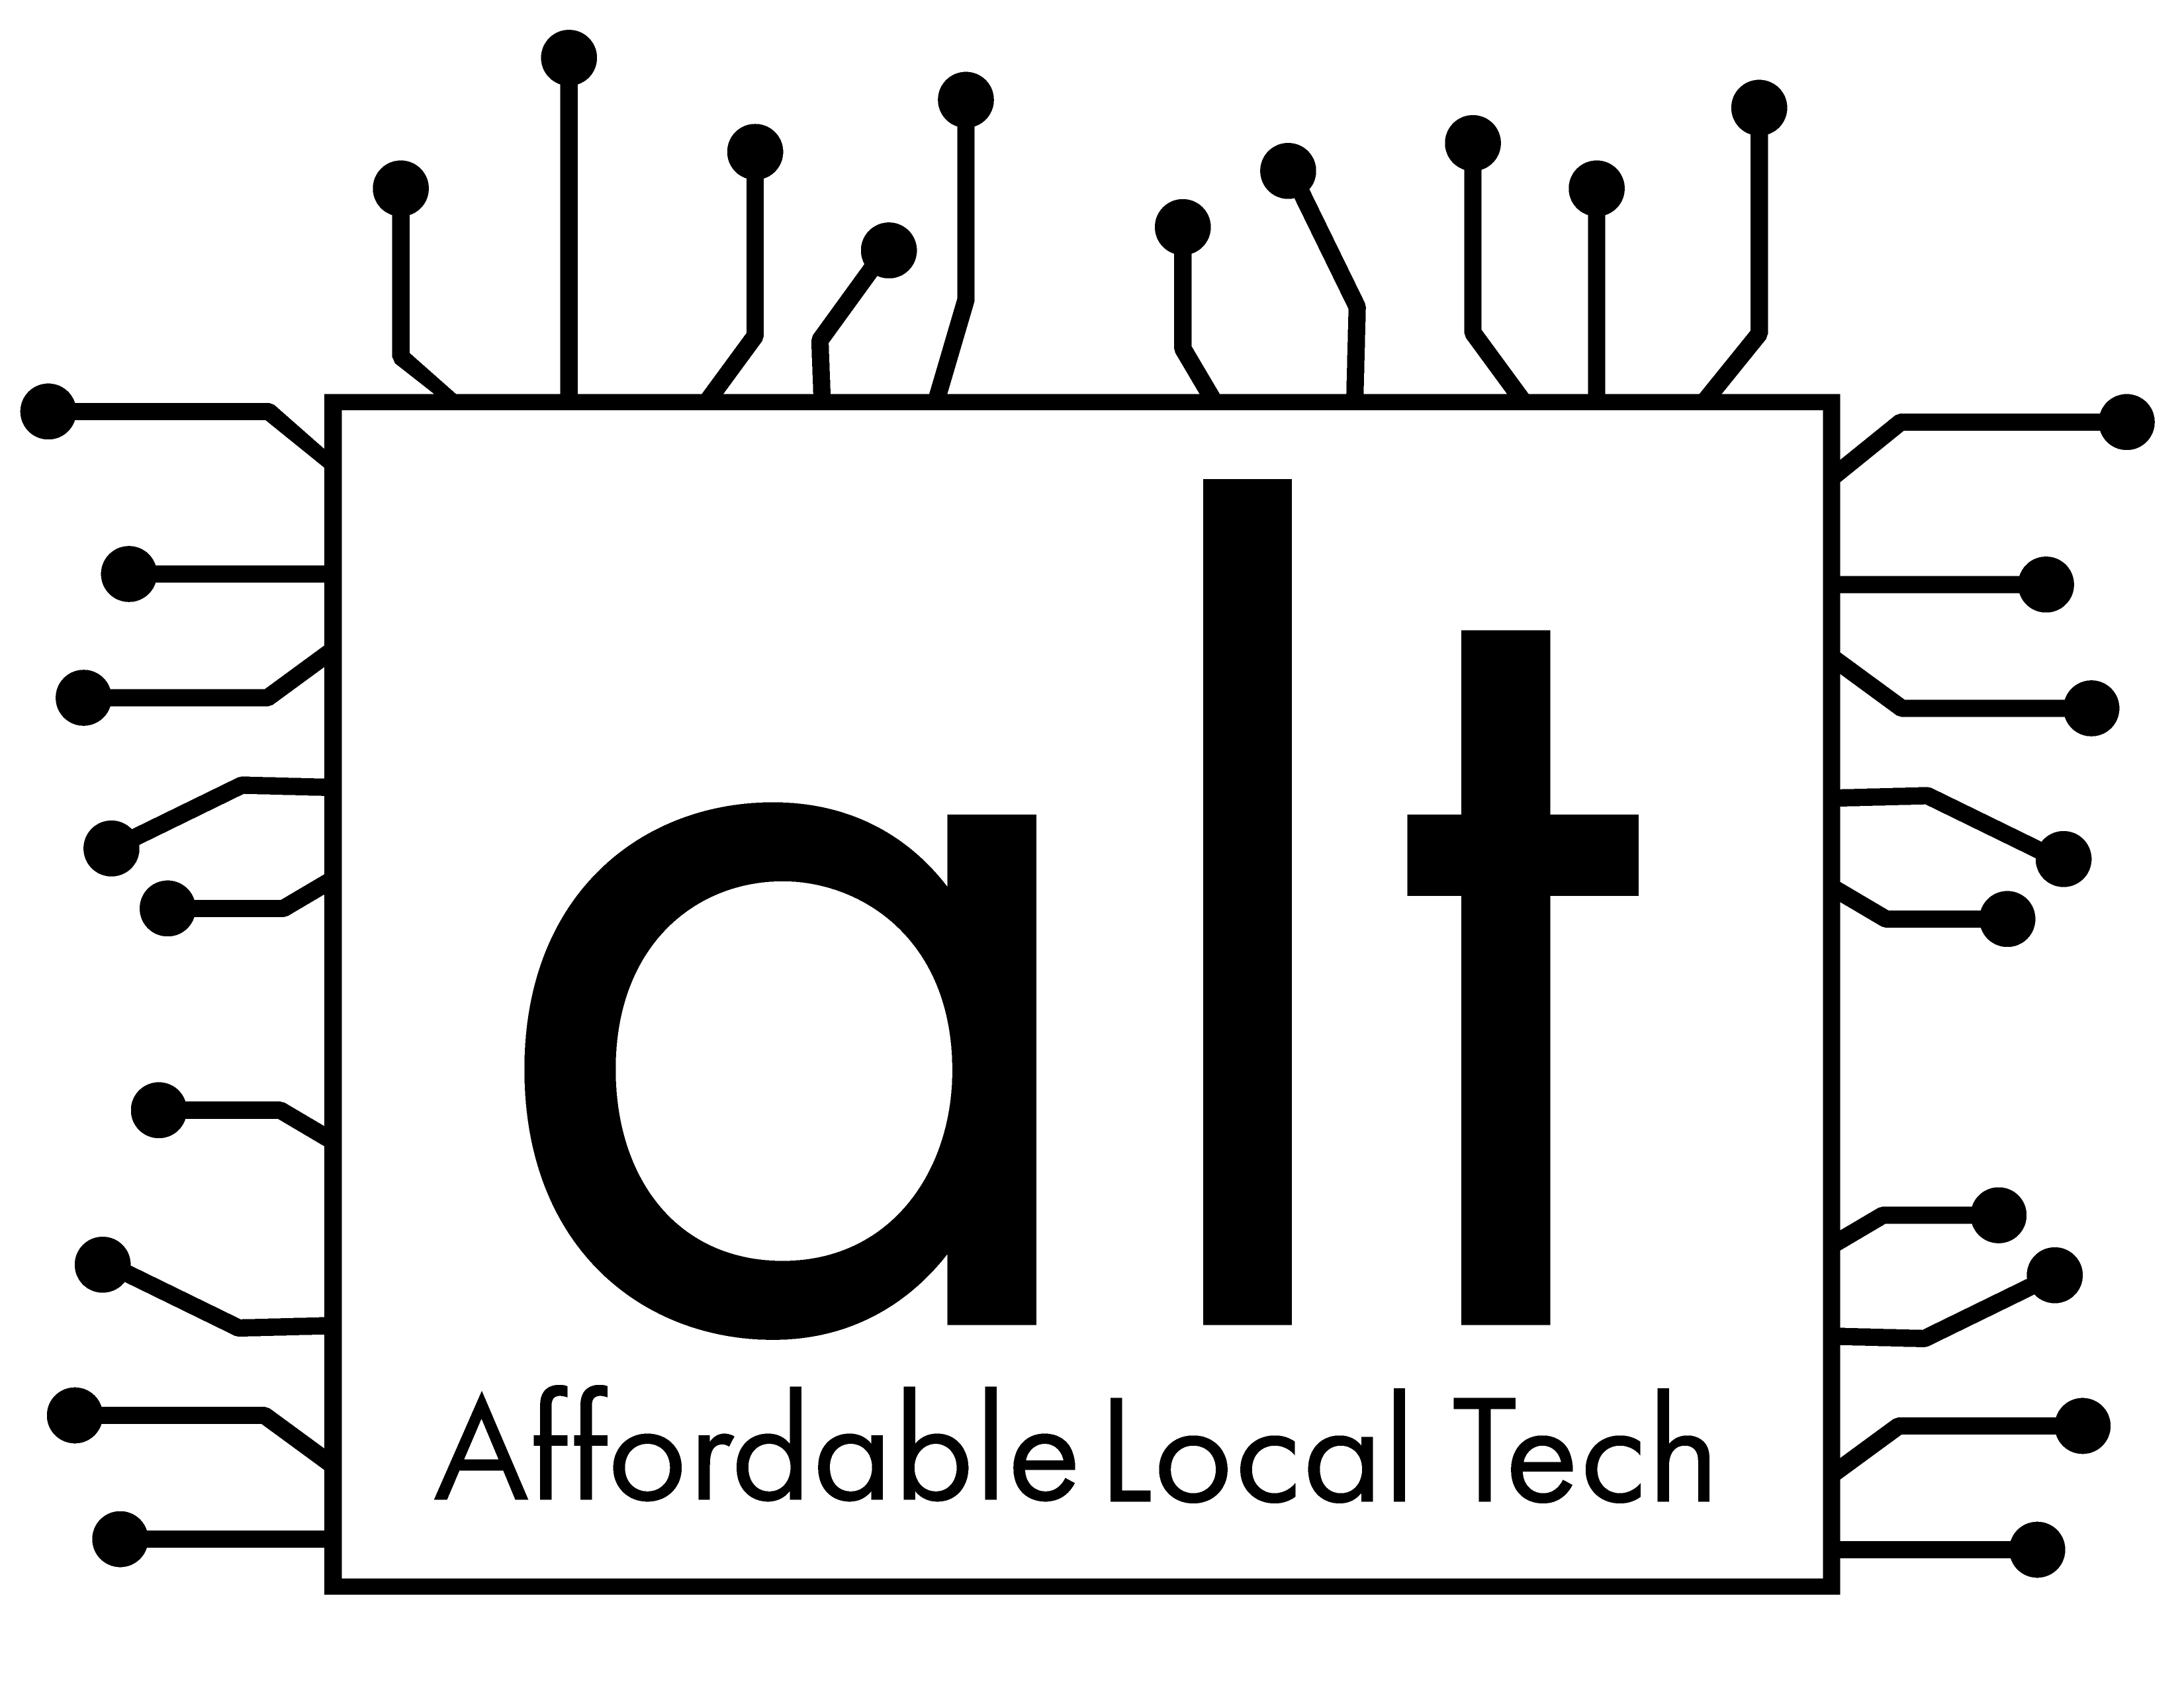 NWUBSGIT